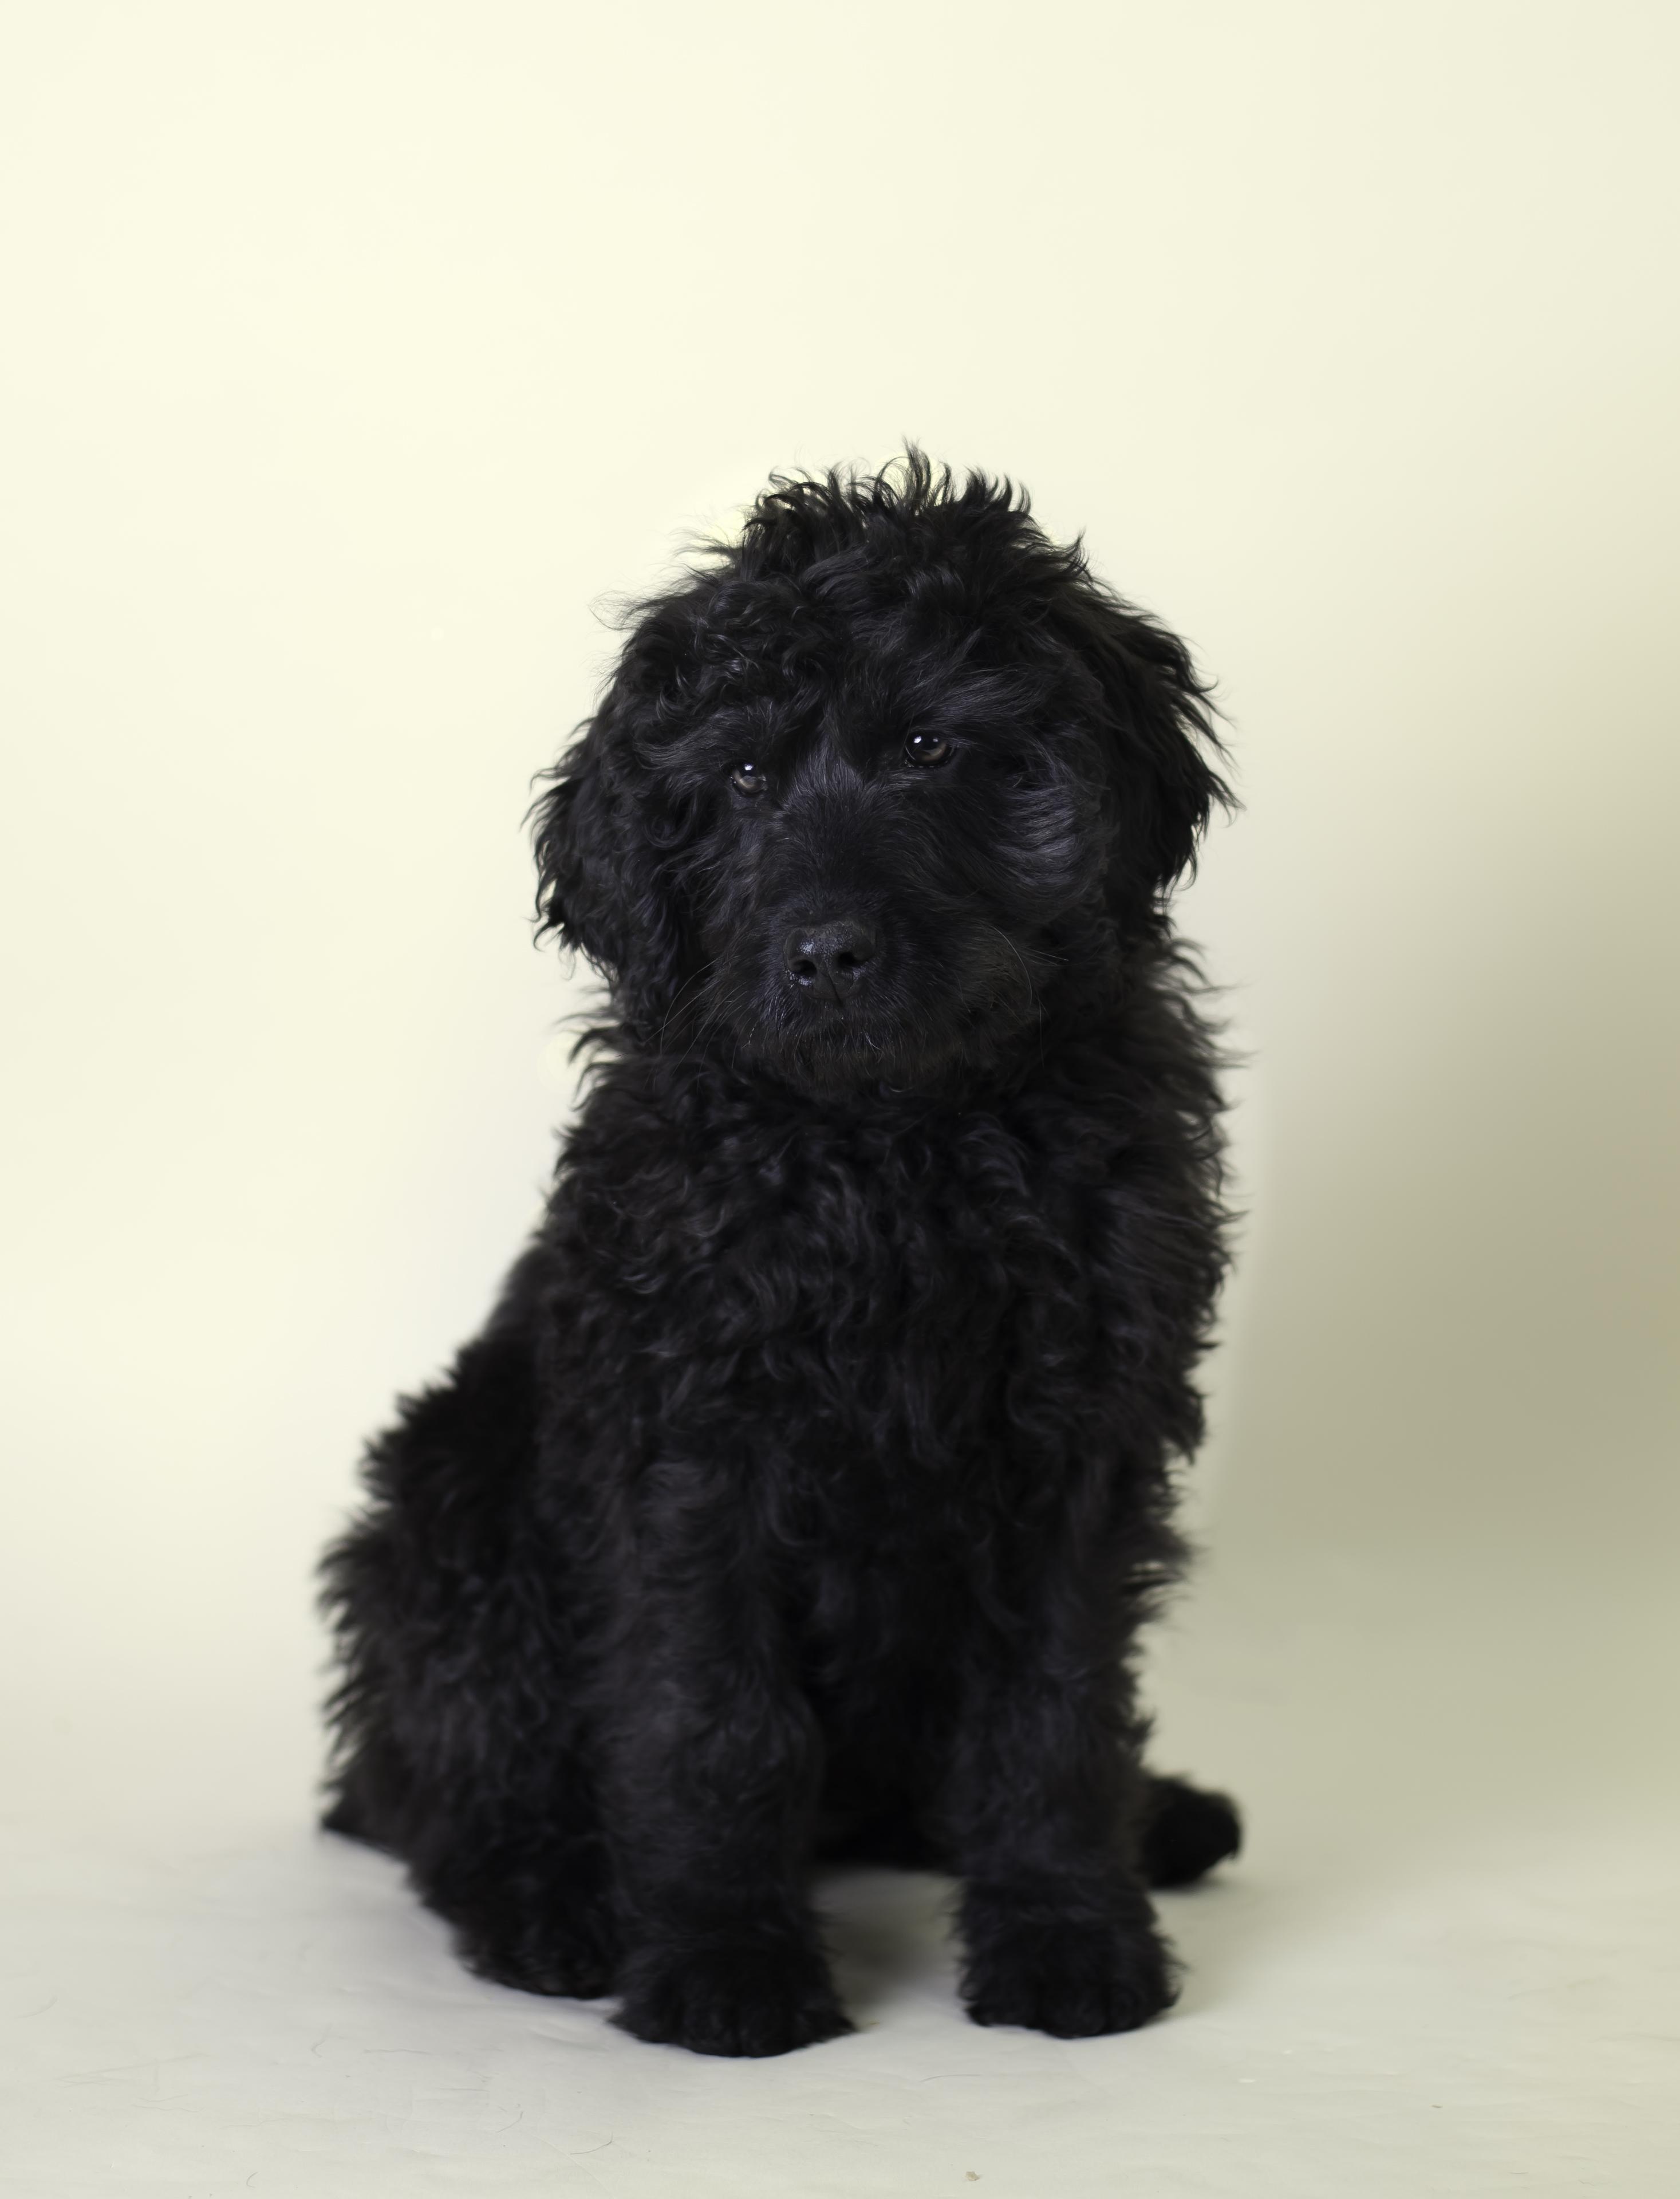 Utah dog photography, puppy